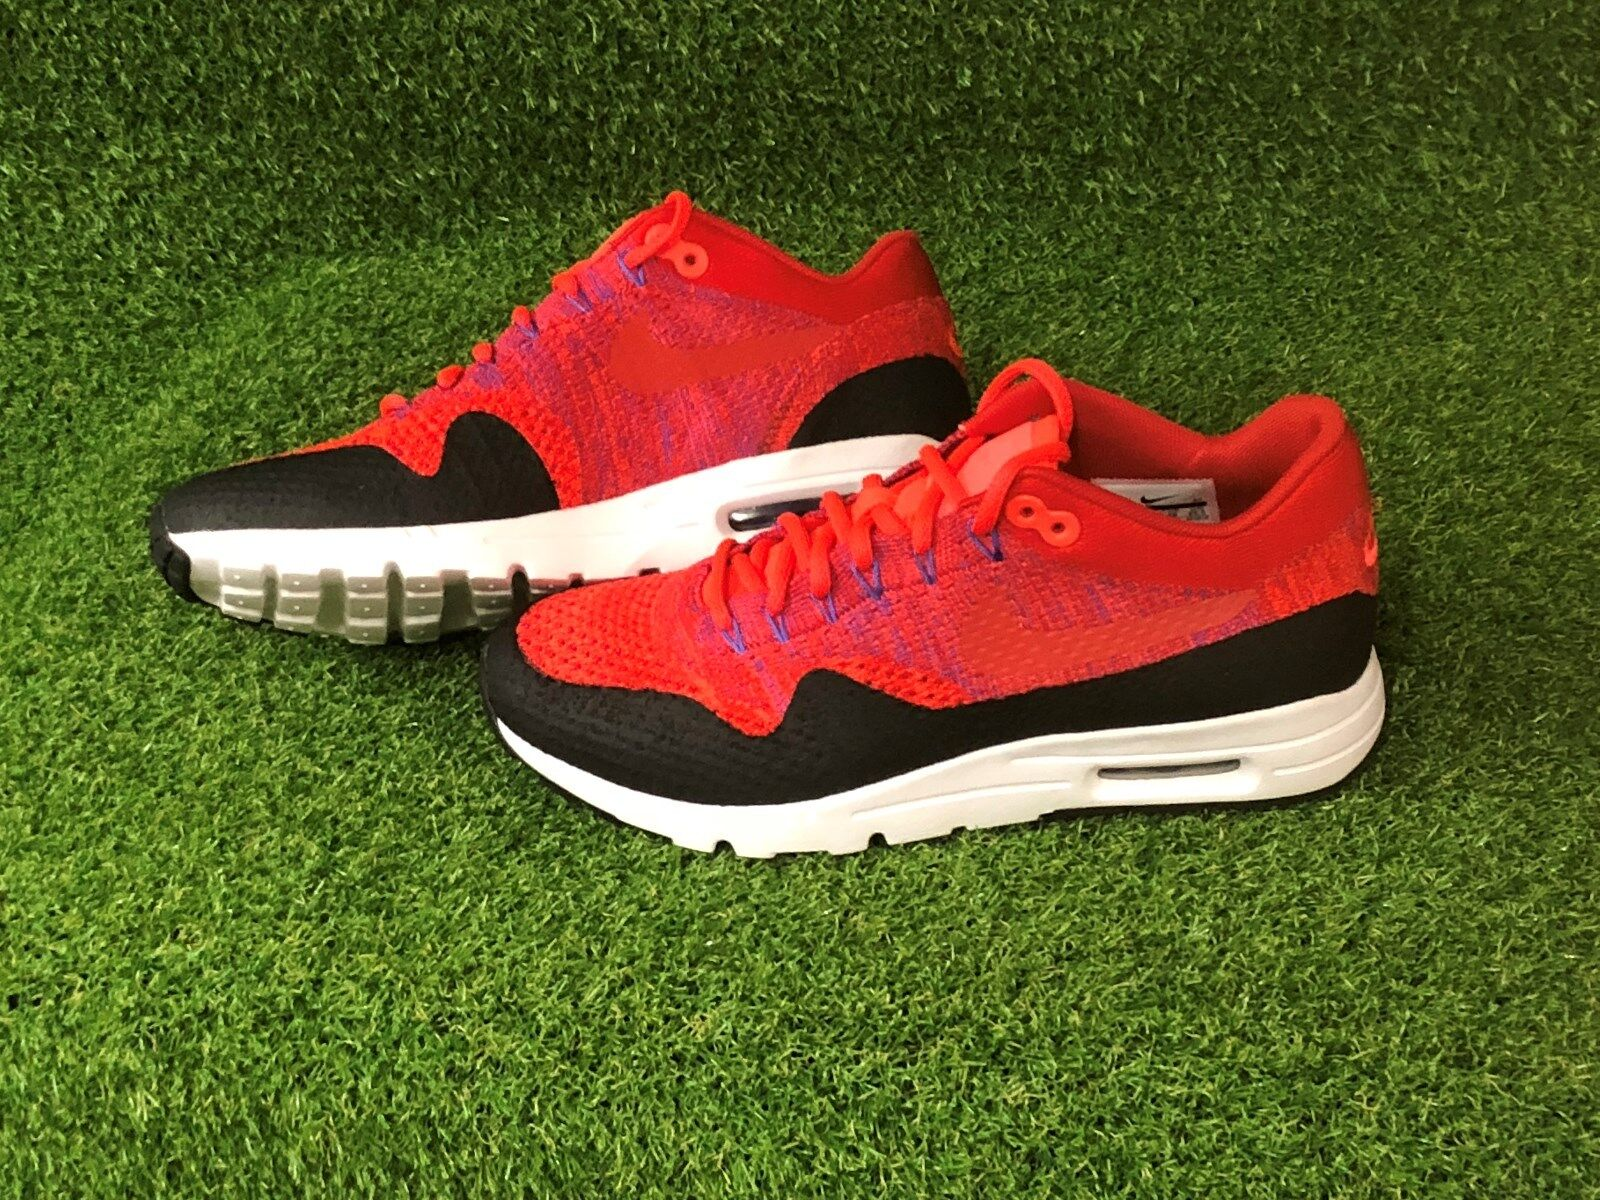 Nike Air Max 1 ultrta [859517 Flyknit Baskets Femmes [859517 ultrta 600] NEUF taille choix 4365e8